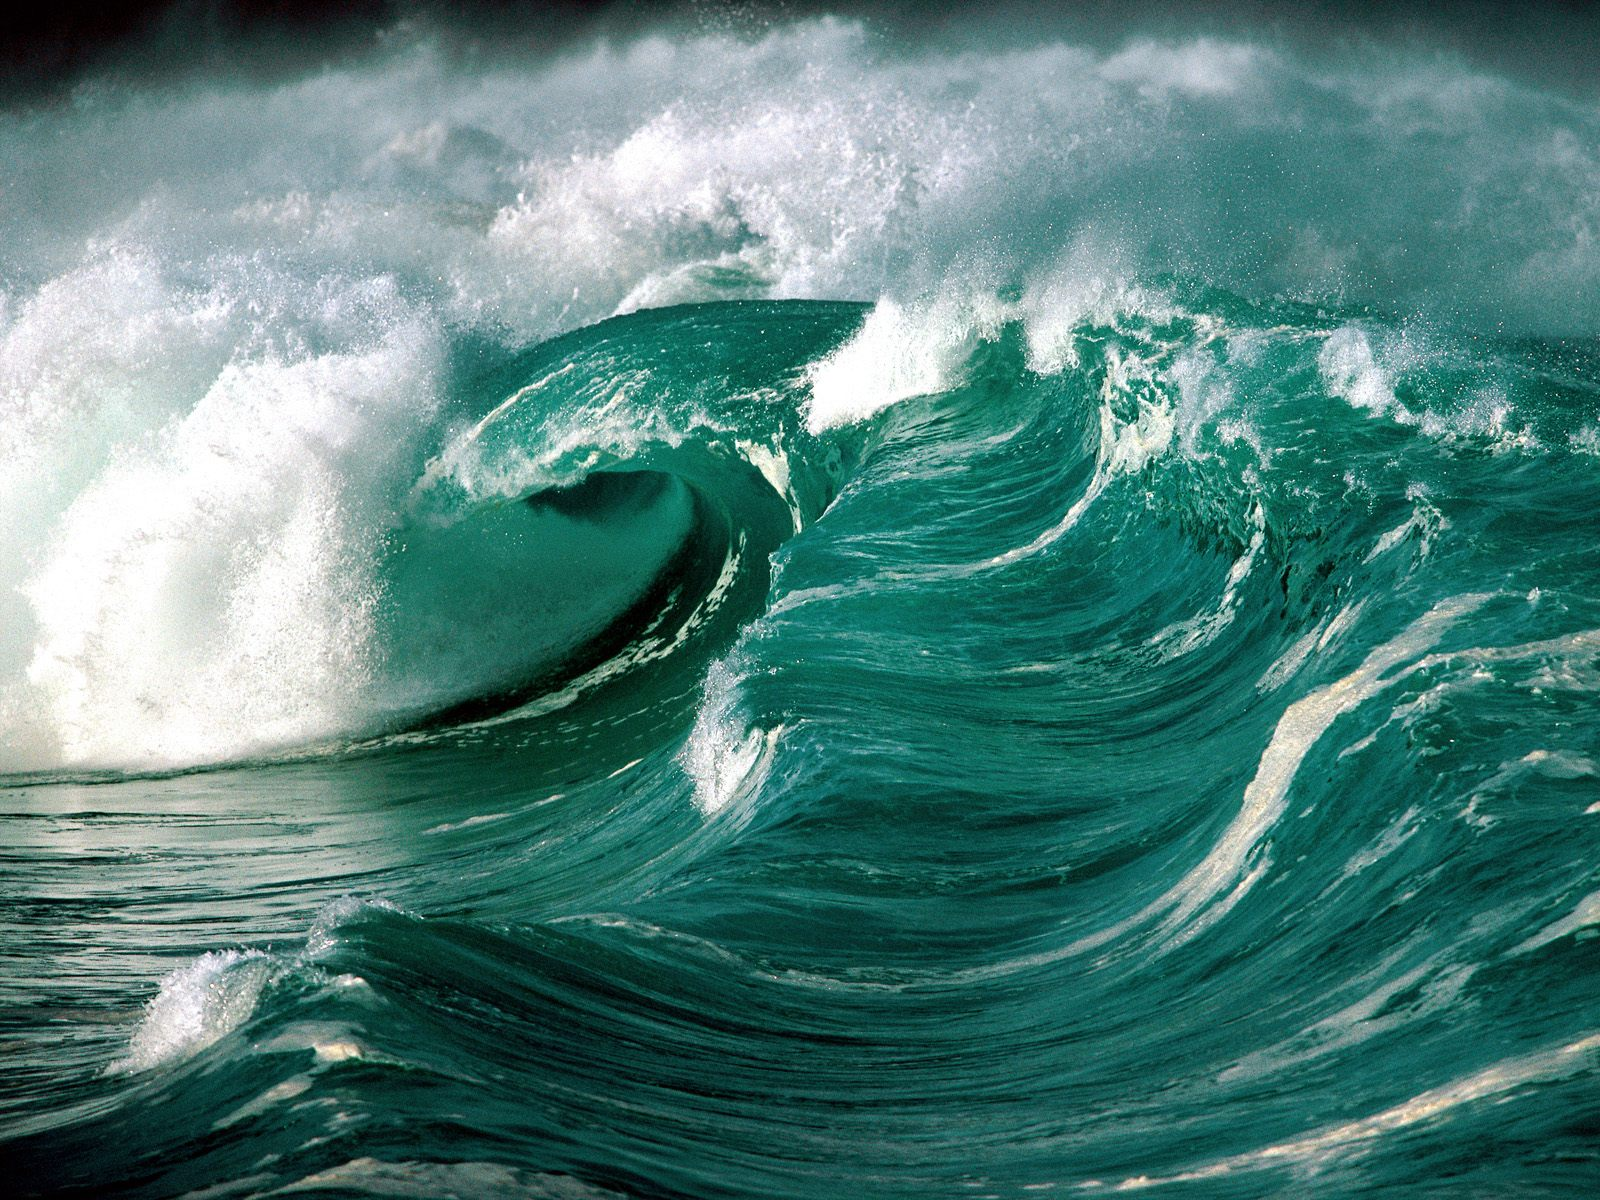 Waves 14544 - Beach photo - Landscape scenery